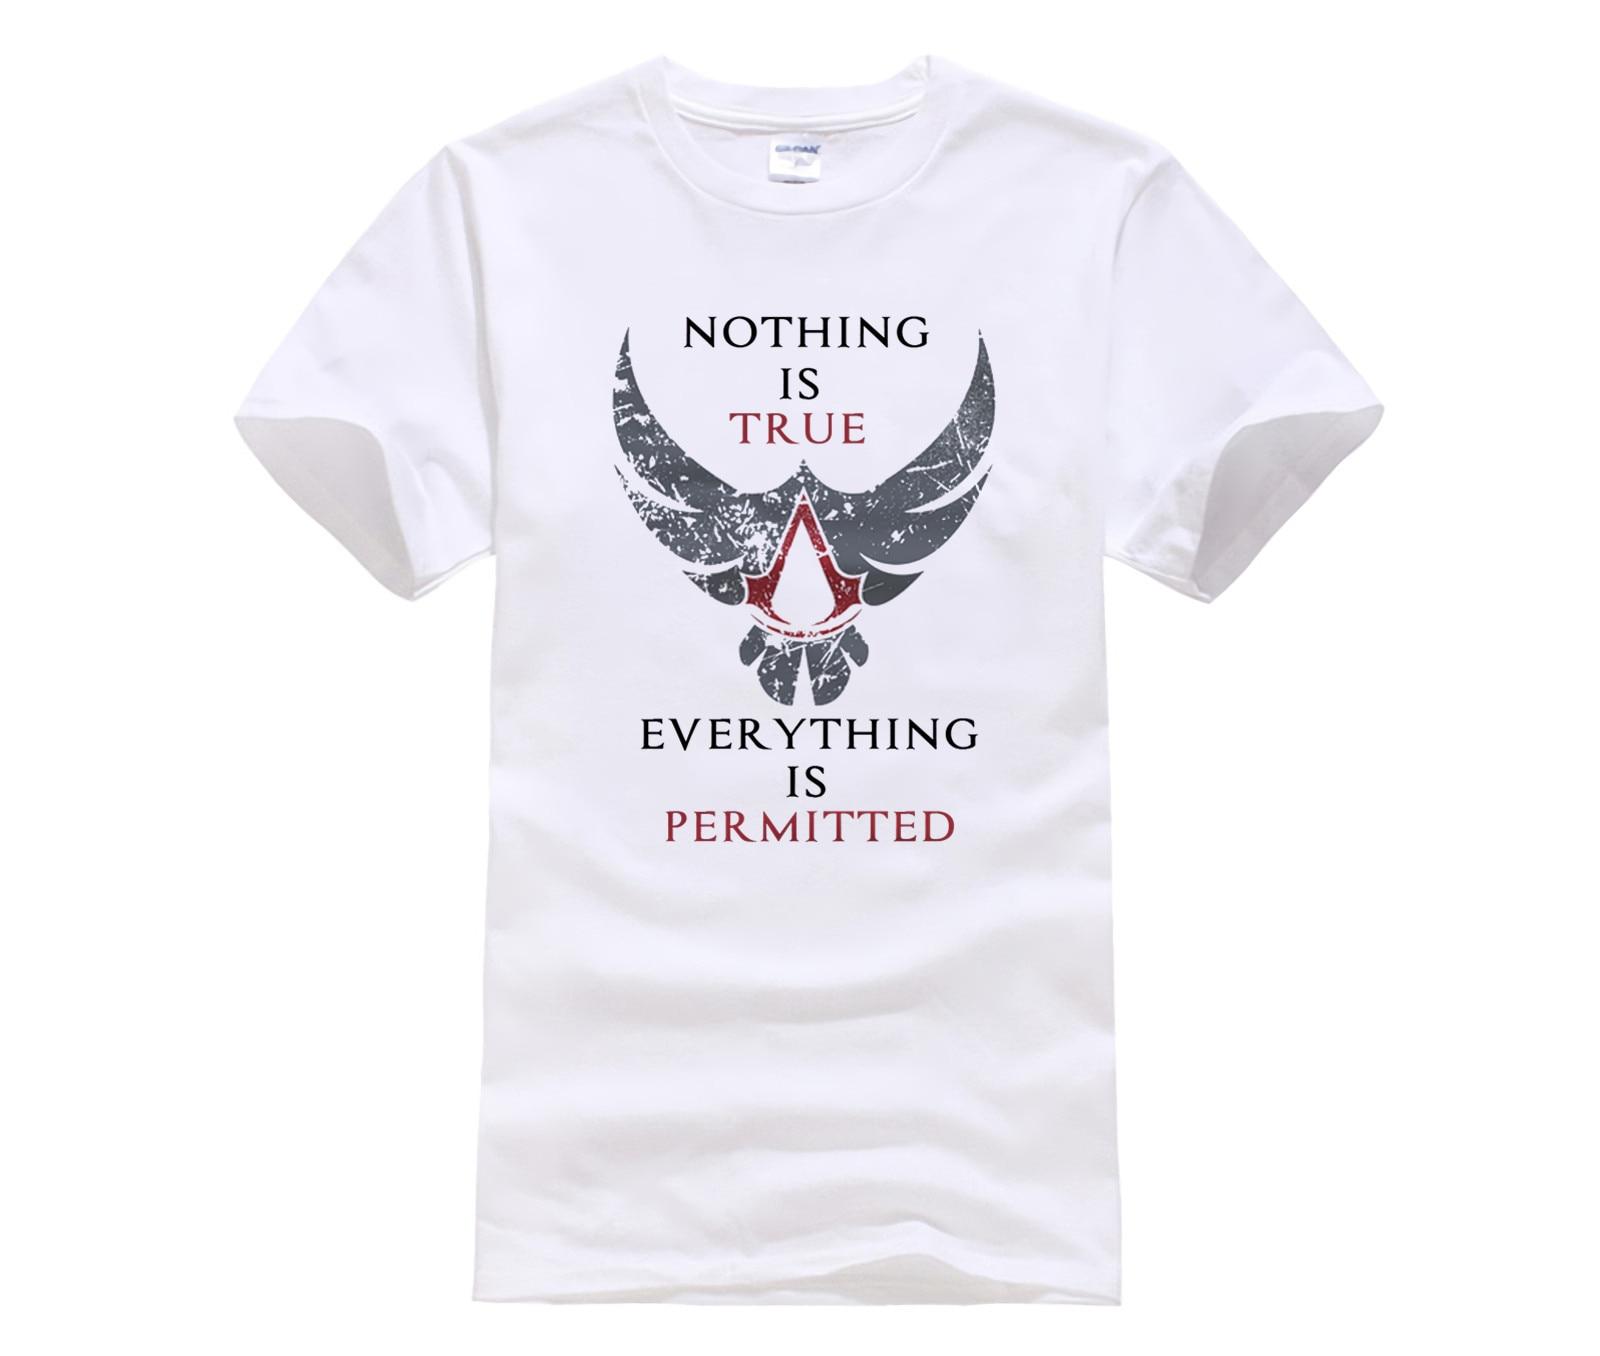 Phiking New anime game t shirt assassins creed tees shirts cotton short sleeve Gamer T-Shirt men